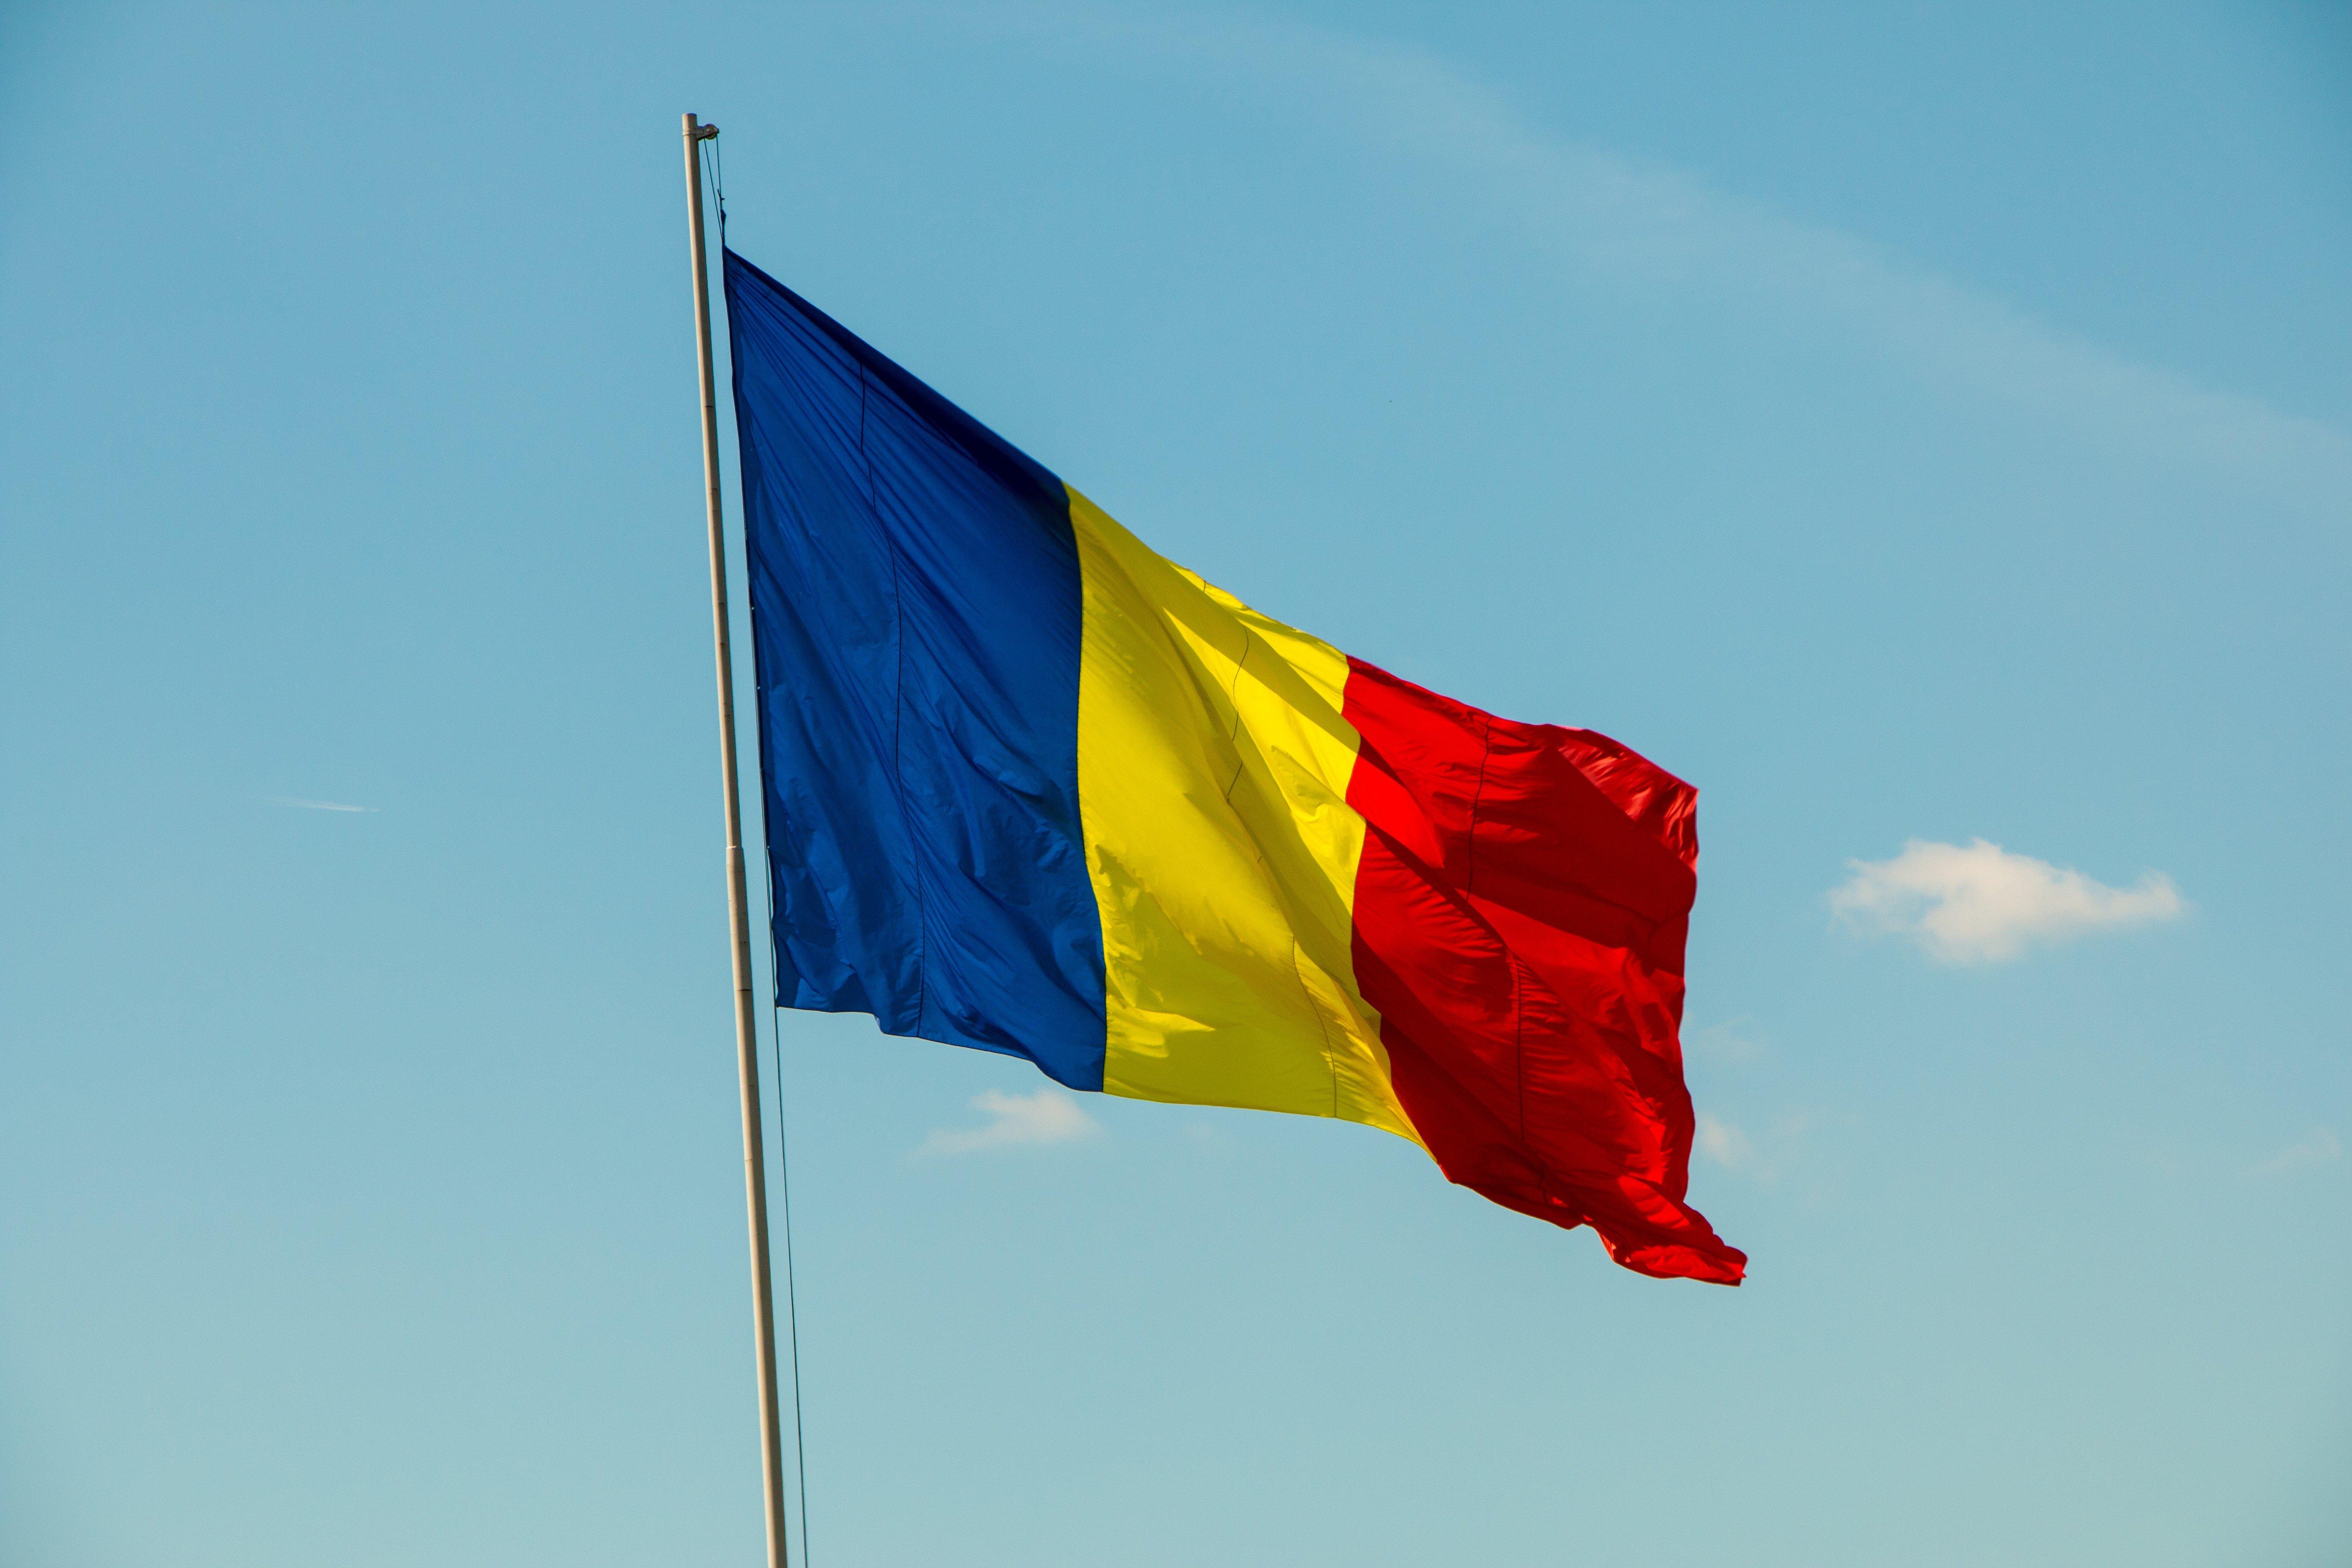 румынский флаг фото предлагают